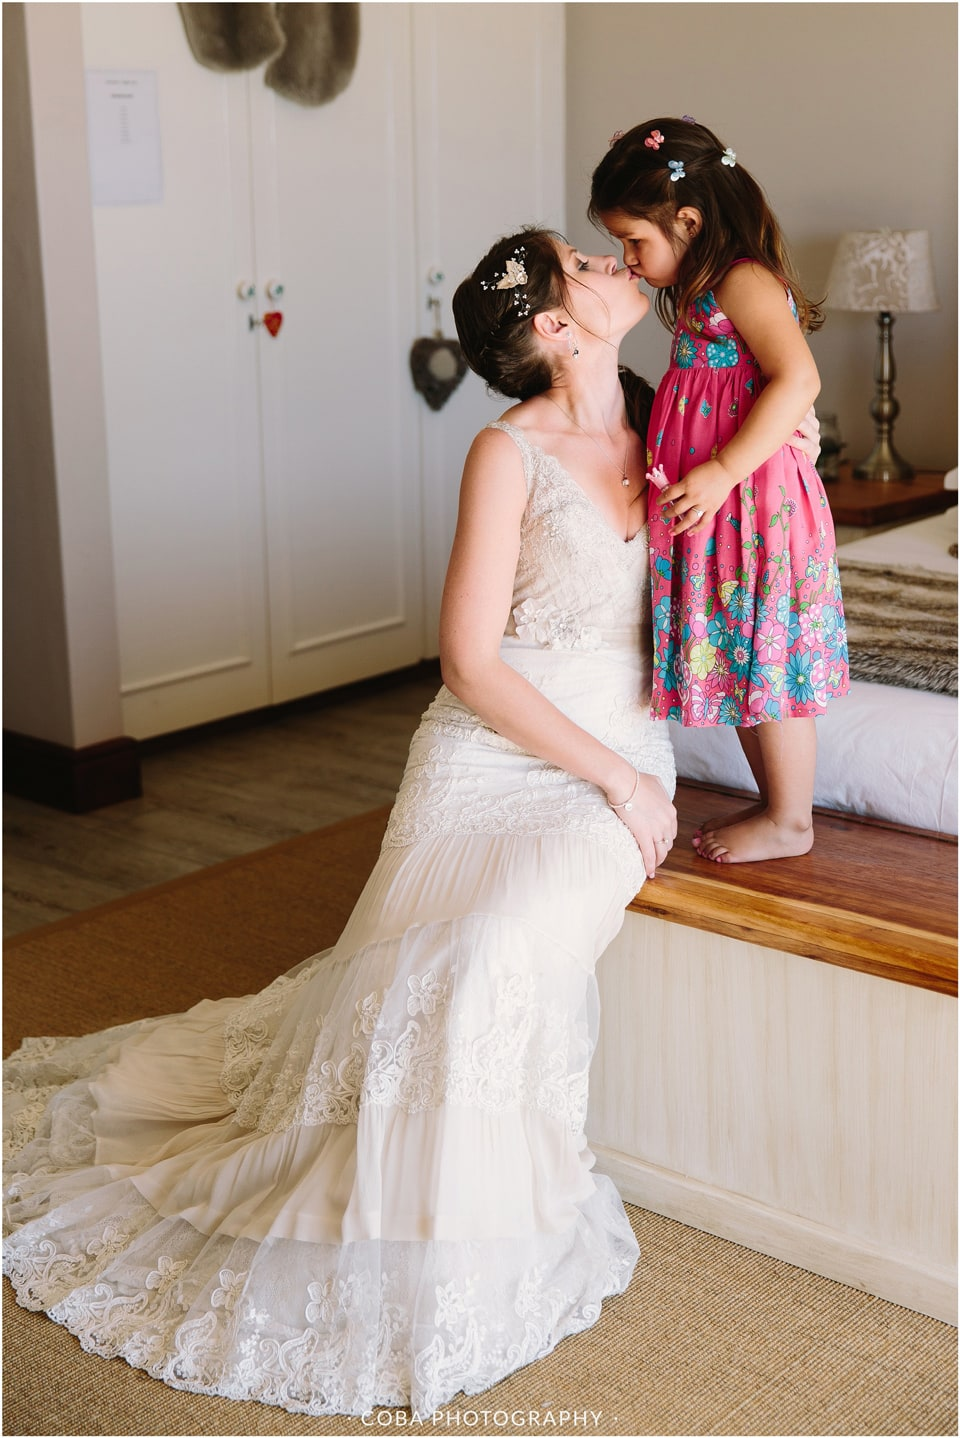 andre-carolien-bosduifklip-wedding-coba-photography-47